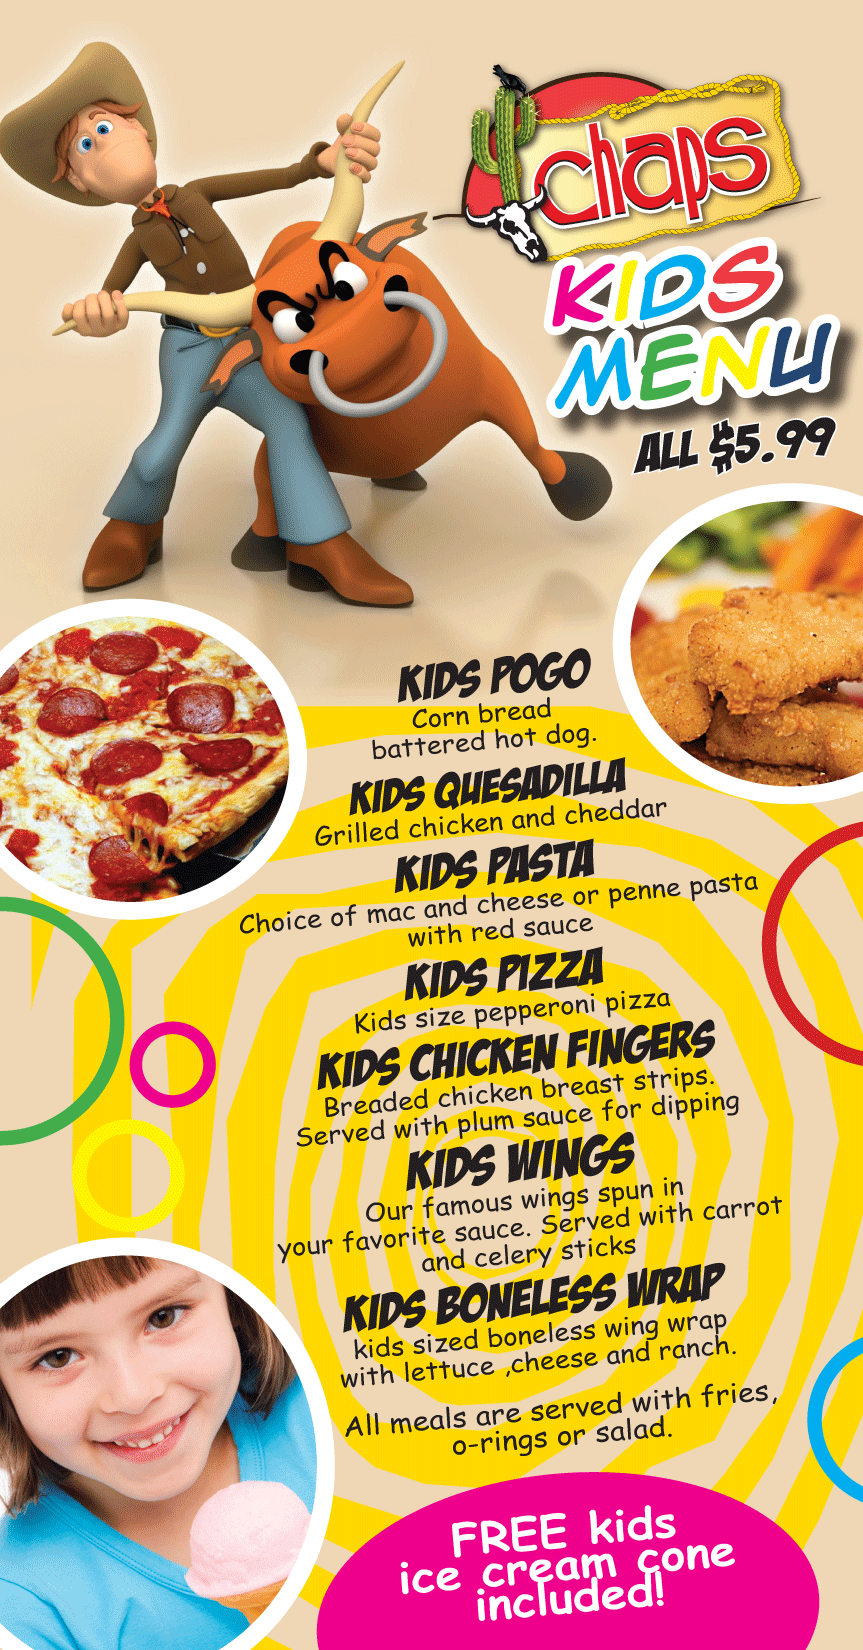 prix fixe menu for kids